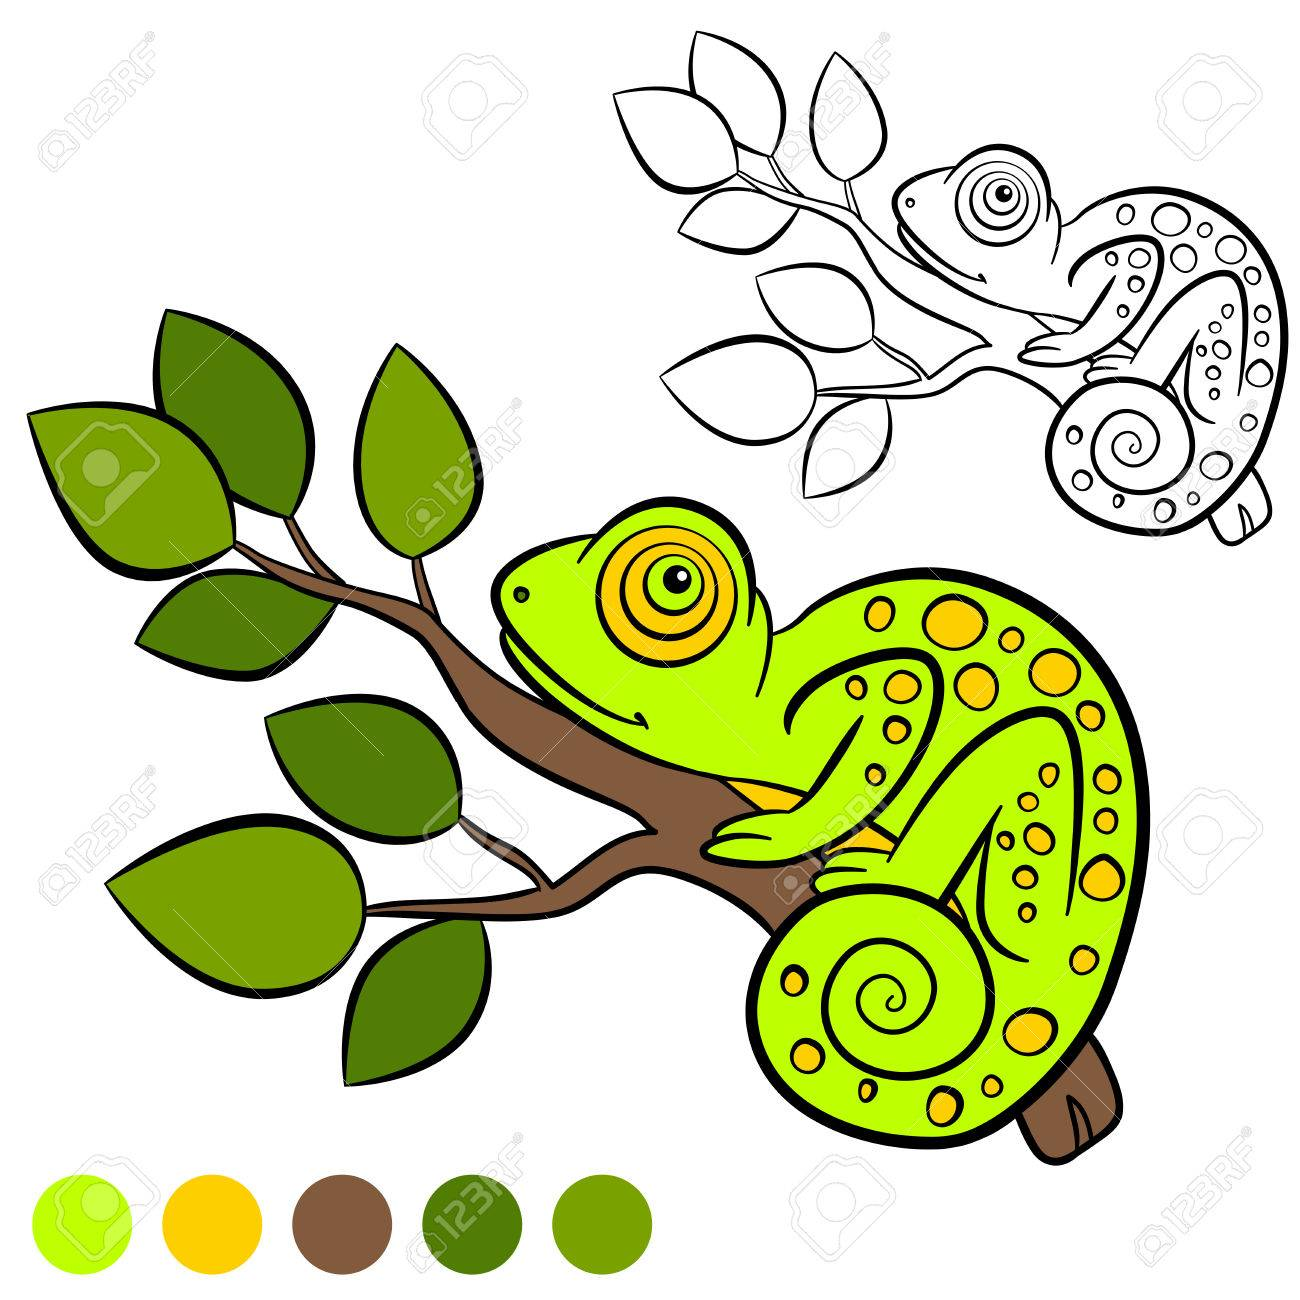 Dibujo Para Colorear Color Me Camaleón Pequeño Camaleón Verde